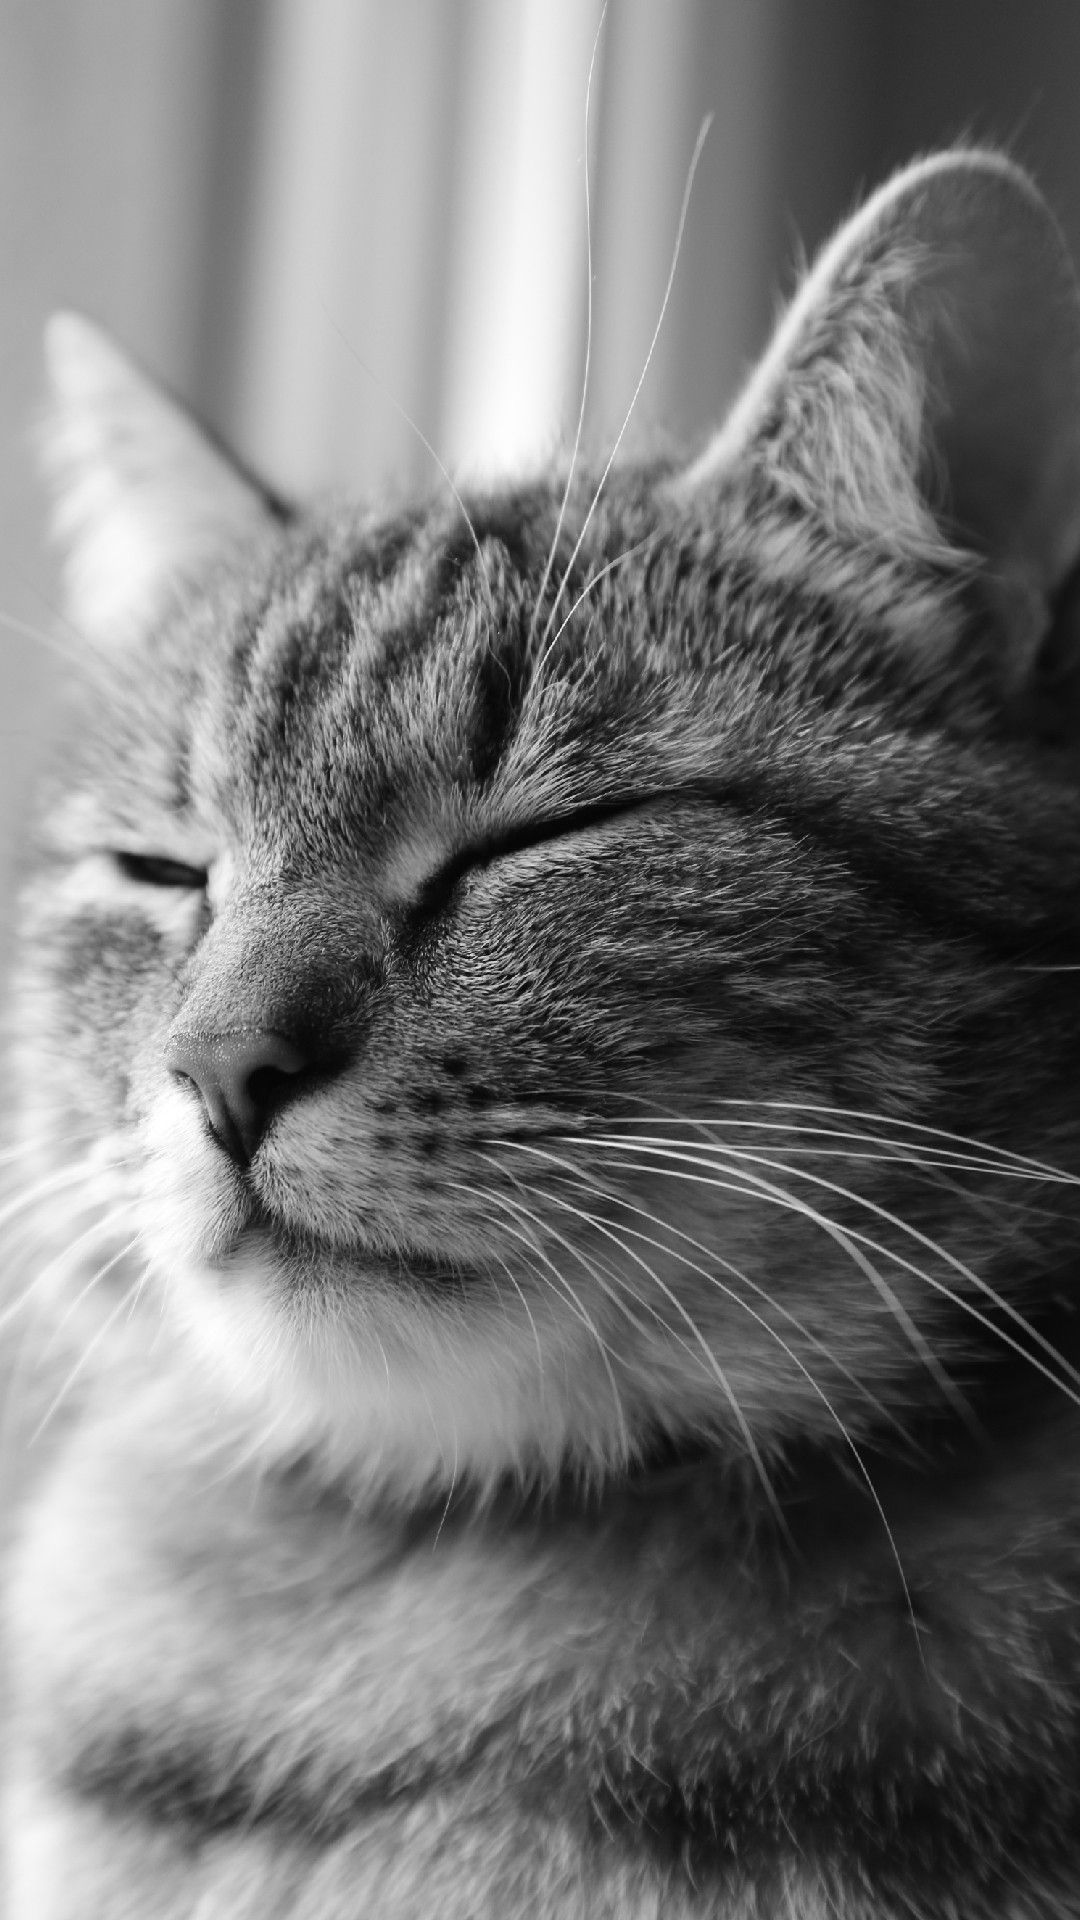 Cat Photo In 2020 Cat Phone Wallpaper Cute Cats Cats